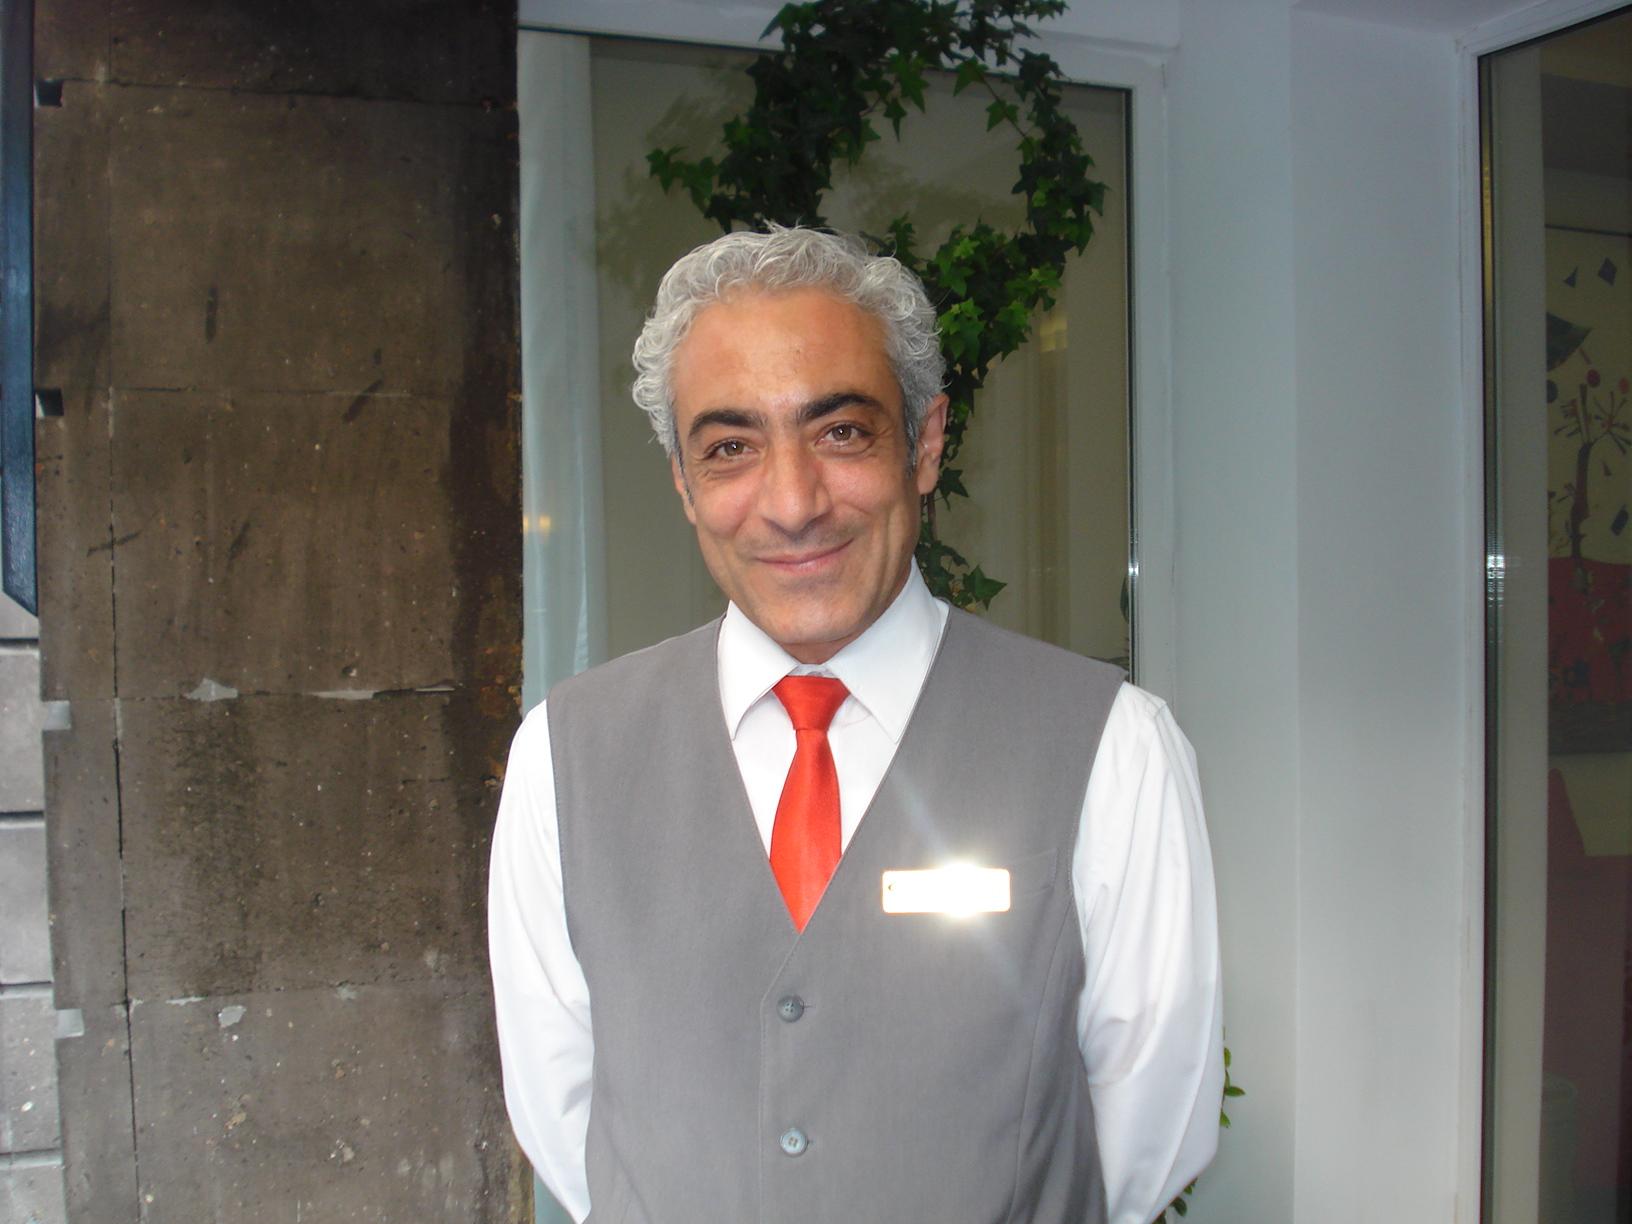 Yerevan, Armenia - Hotel Doorman